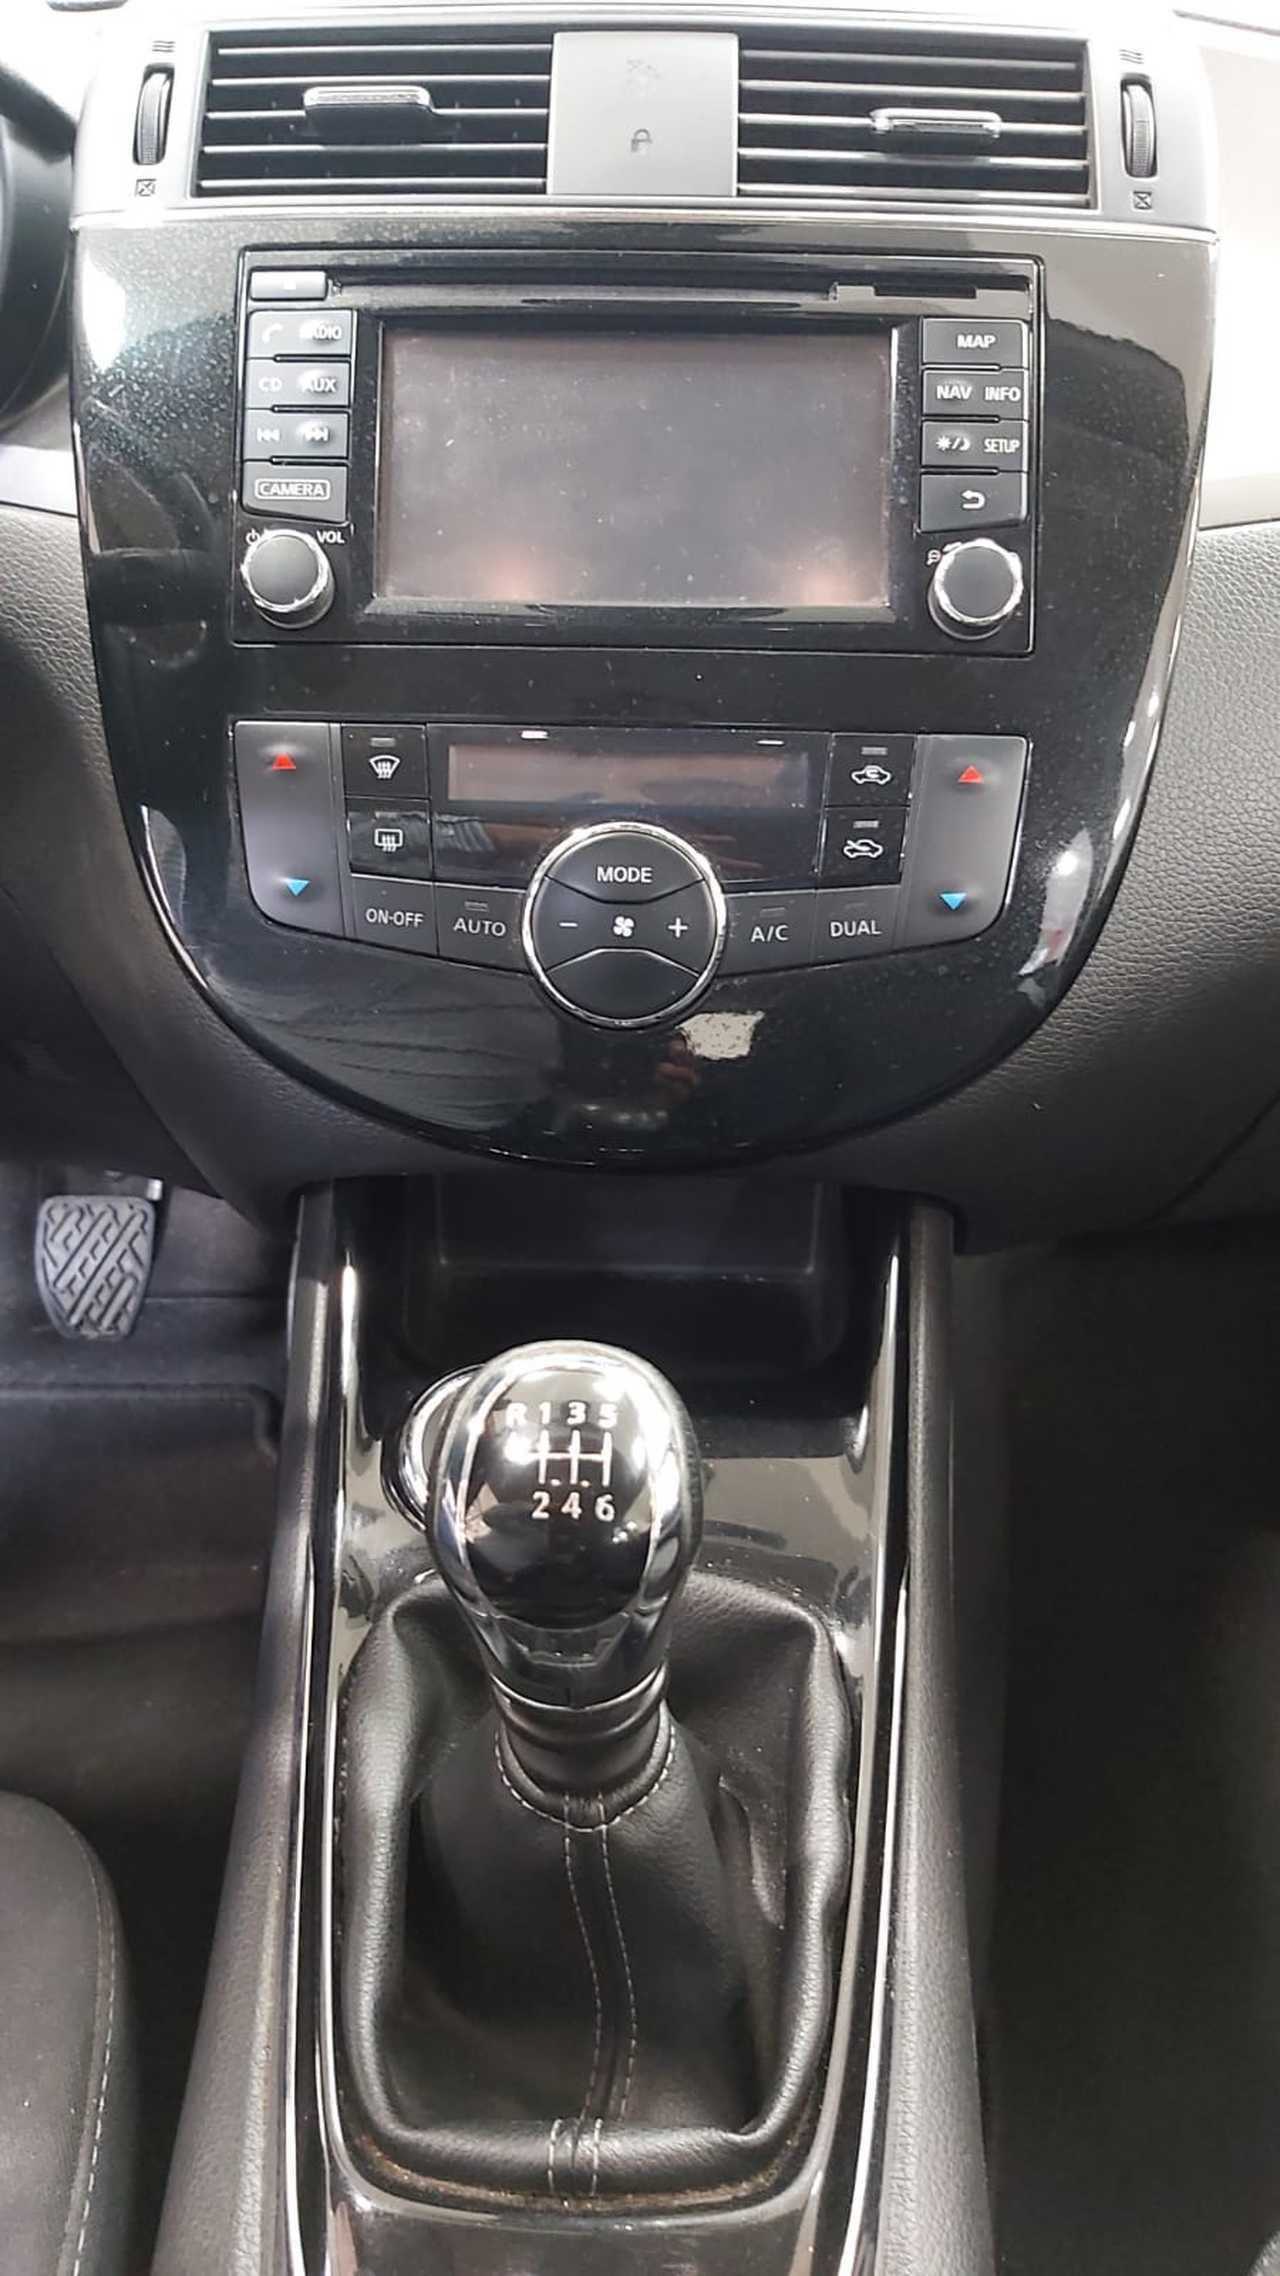 Nissan Pulsar 1.5 DCi ACENTA full